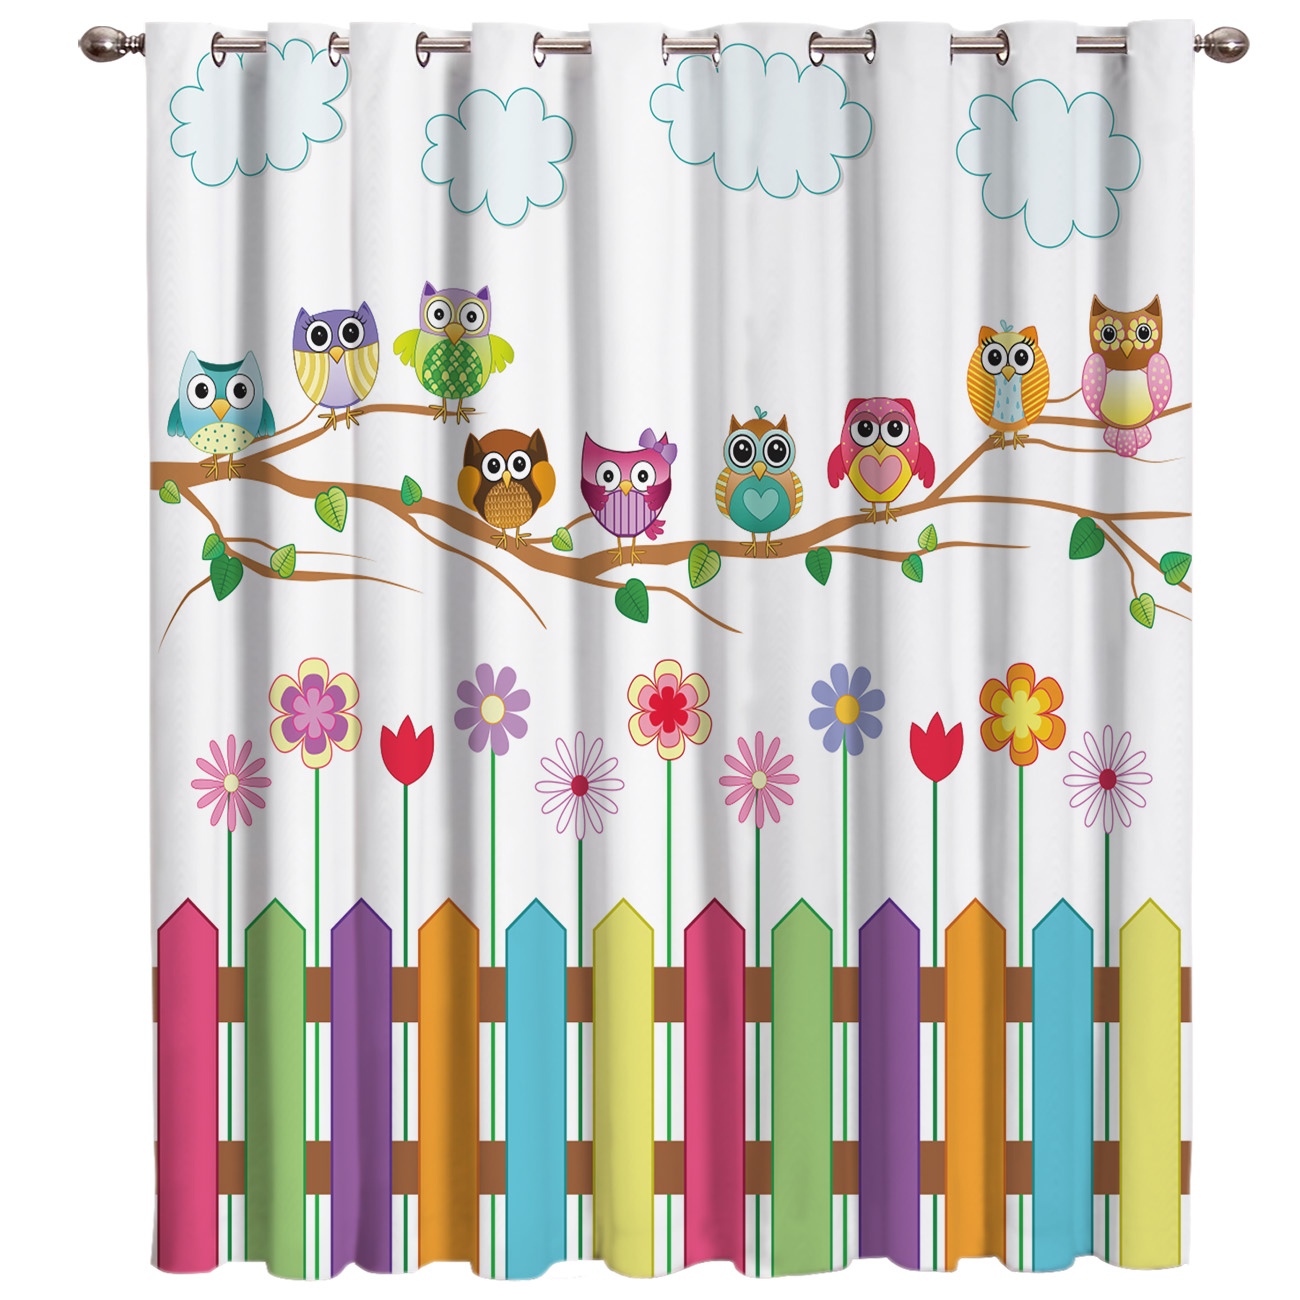 Cartoon Kid Cute Owl Window Curtains Dark Window Blinds Living Room Decor Bedroom Fabric Kids Curtain Panels With Grommets